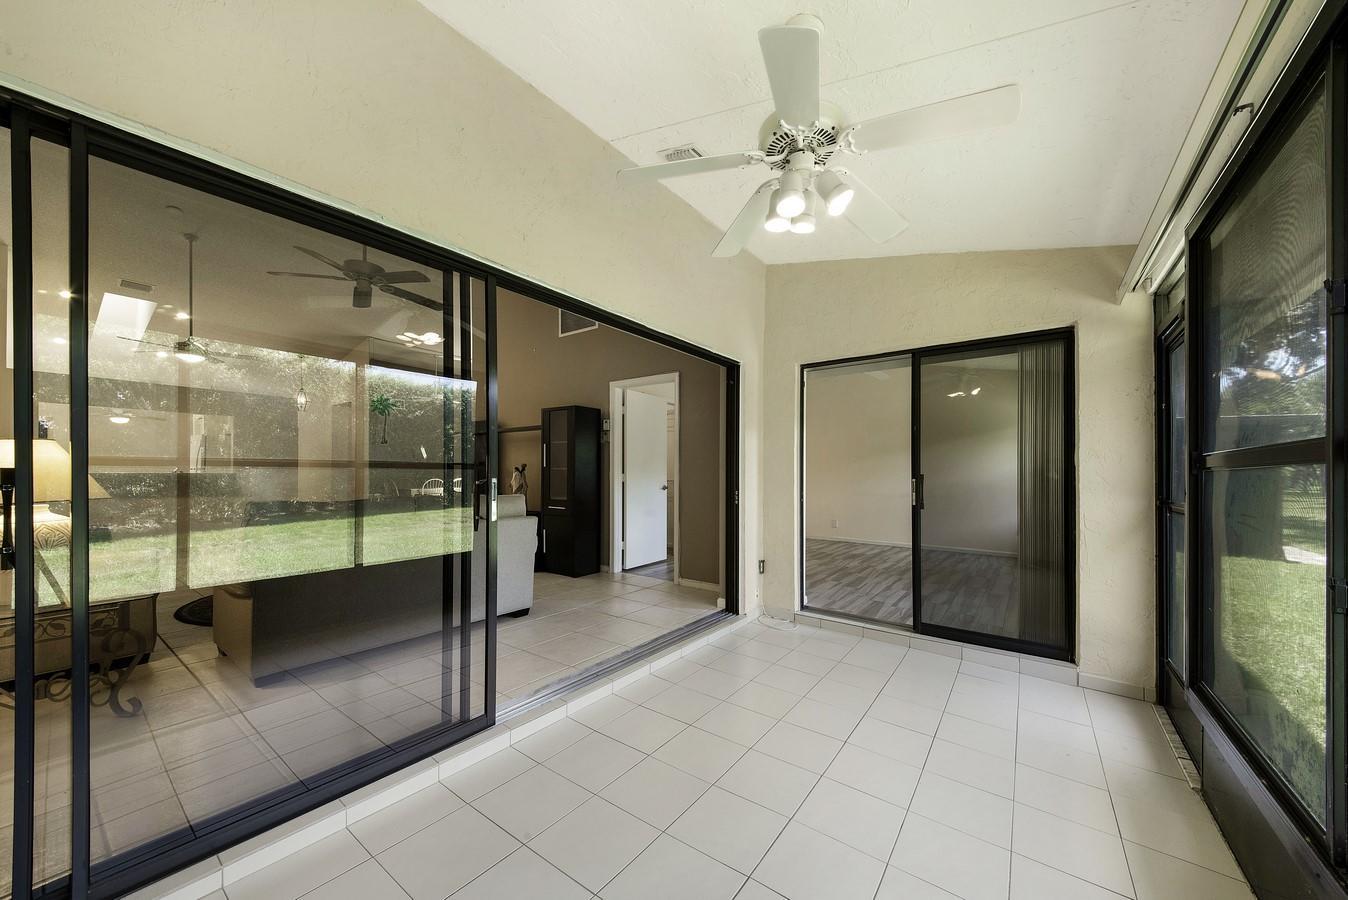 9747 Pavarotti Terrace 103 Boynton Beach, FL 33437 photo 23